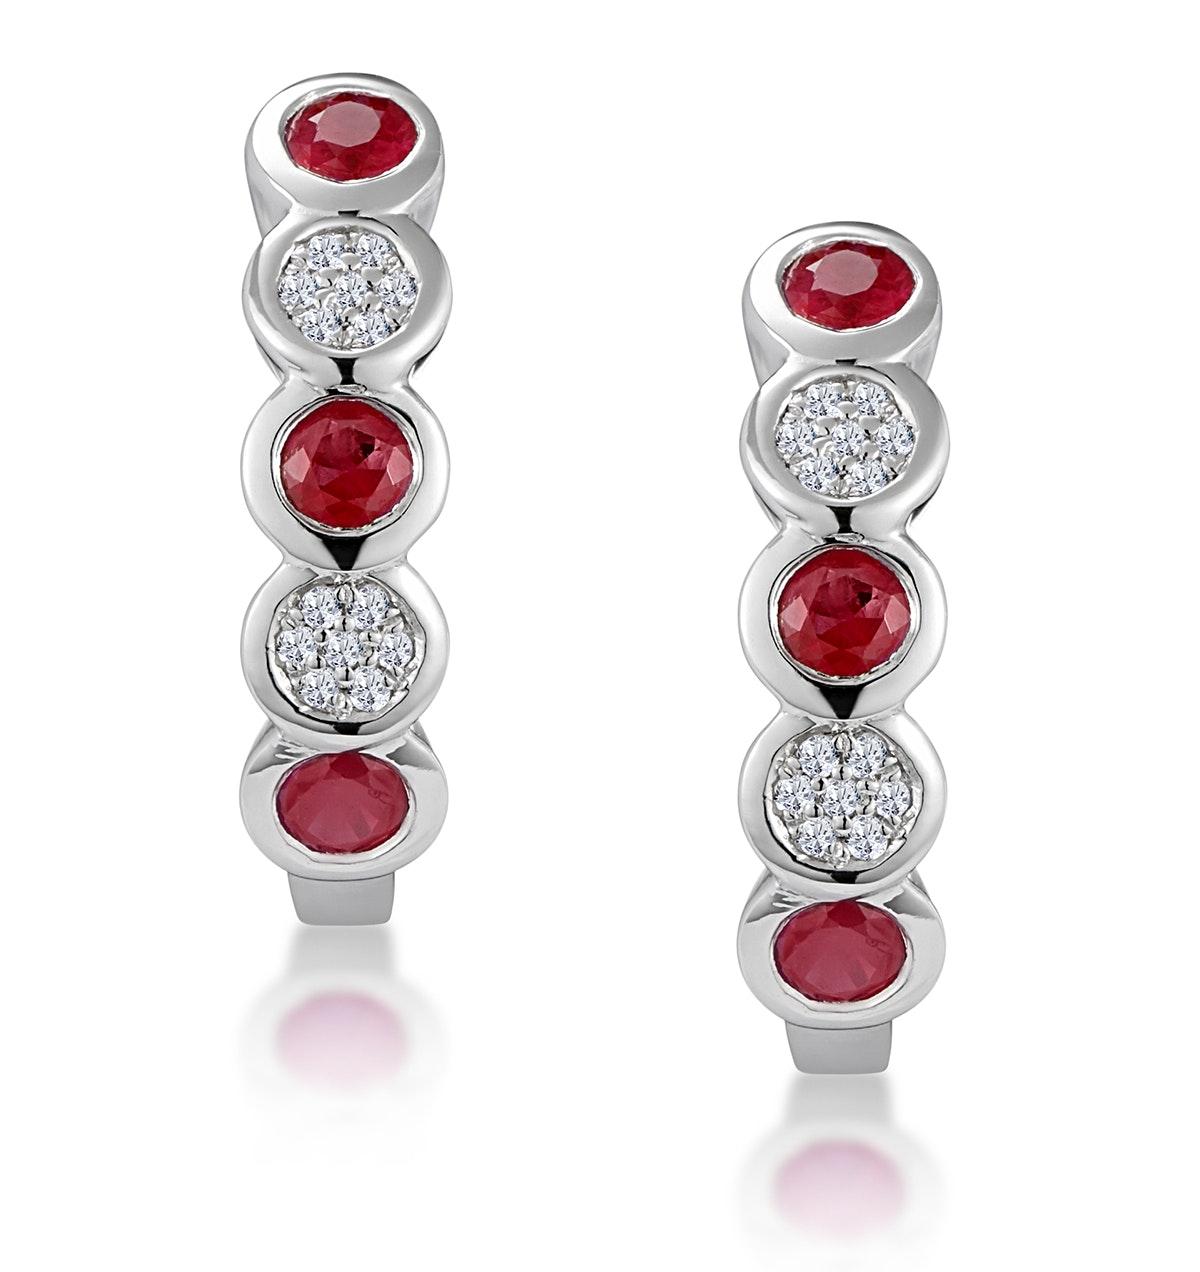 Stellato Ruby and Diamond Eternity Earrings in 9K White Gold